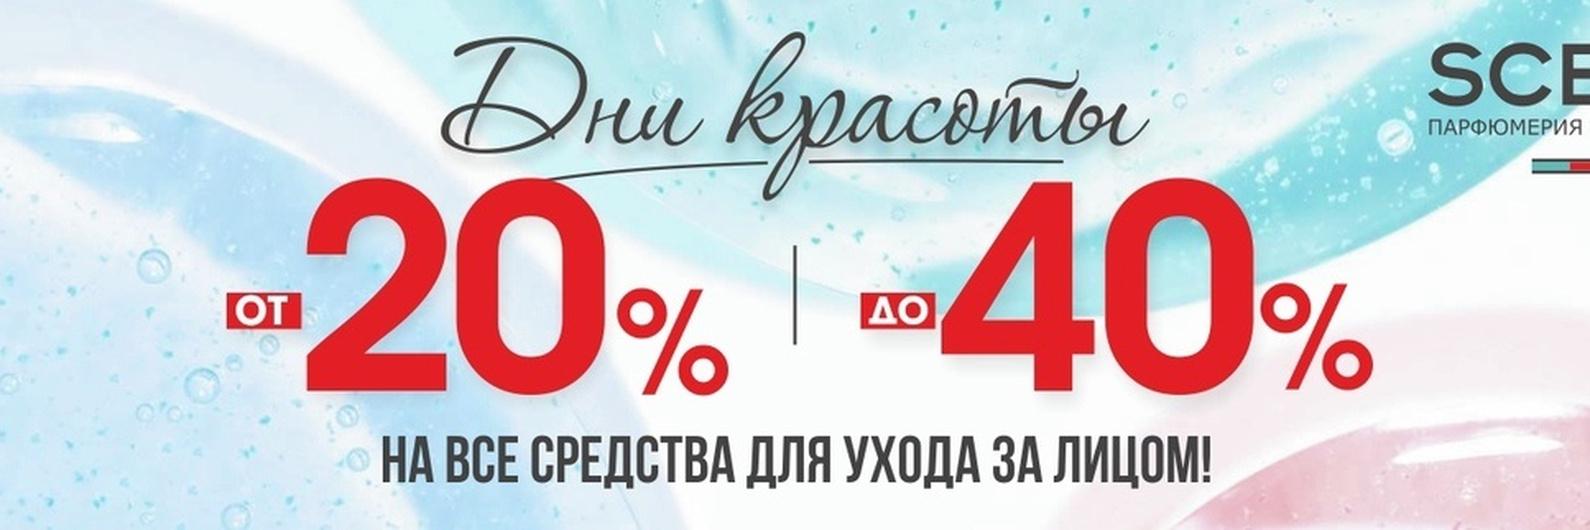 магазин парфюмерии сцент ру